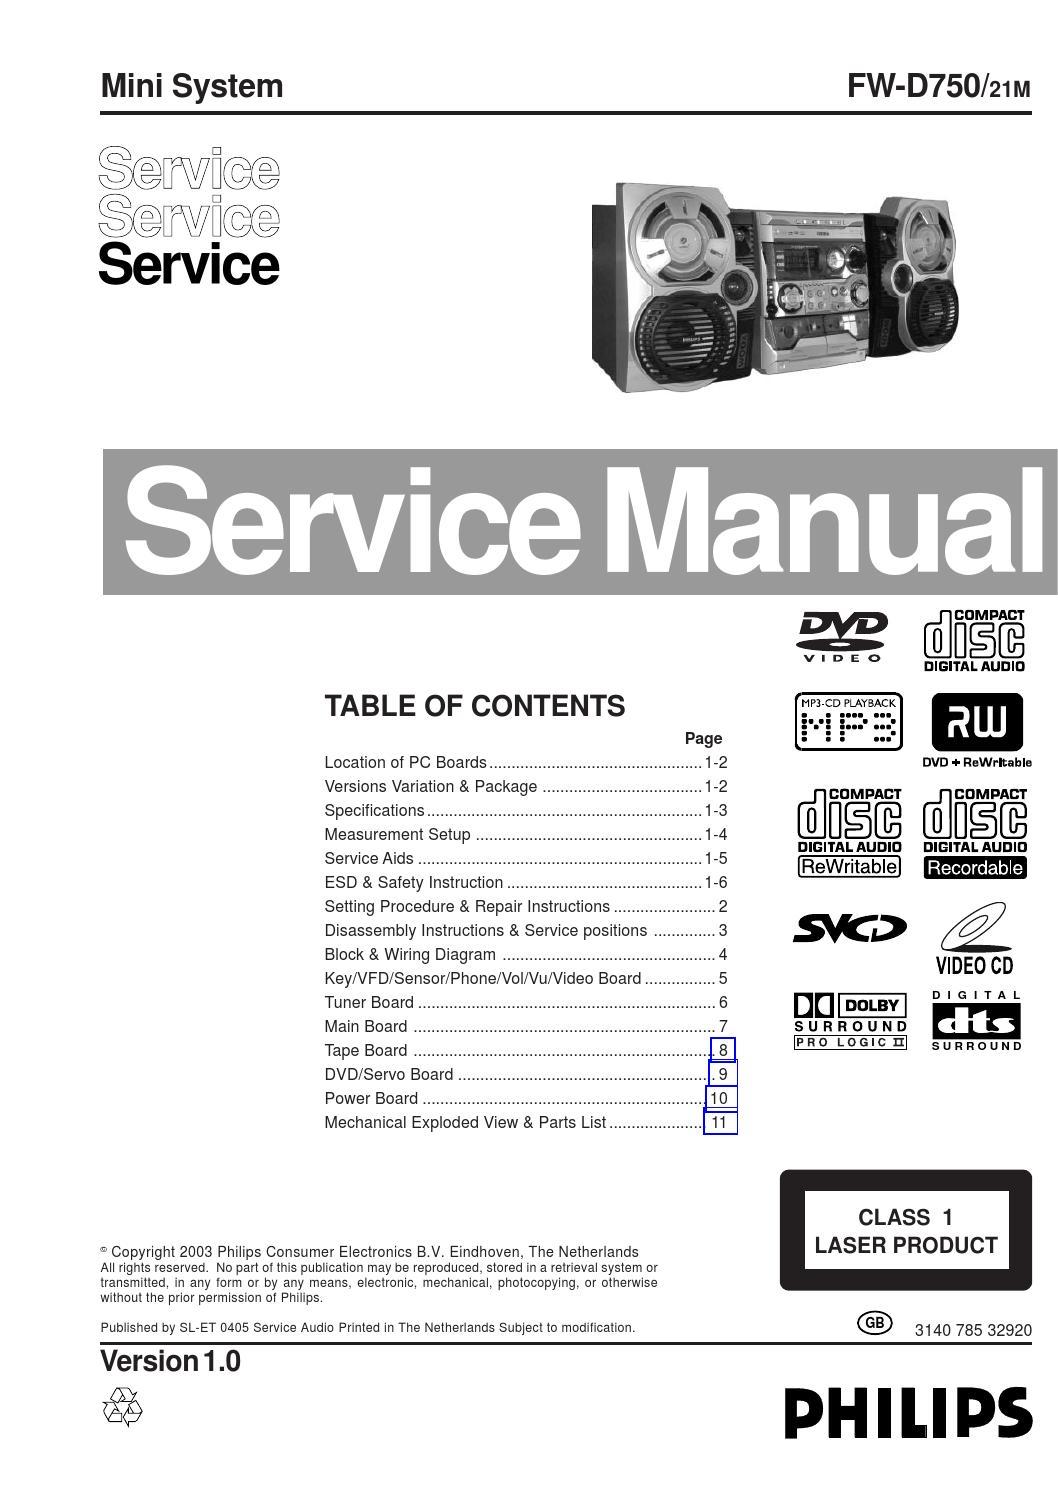 Manual De Servi U00e7o Mini System Philips Fw D750 21m By